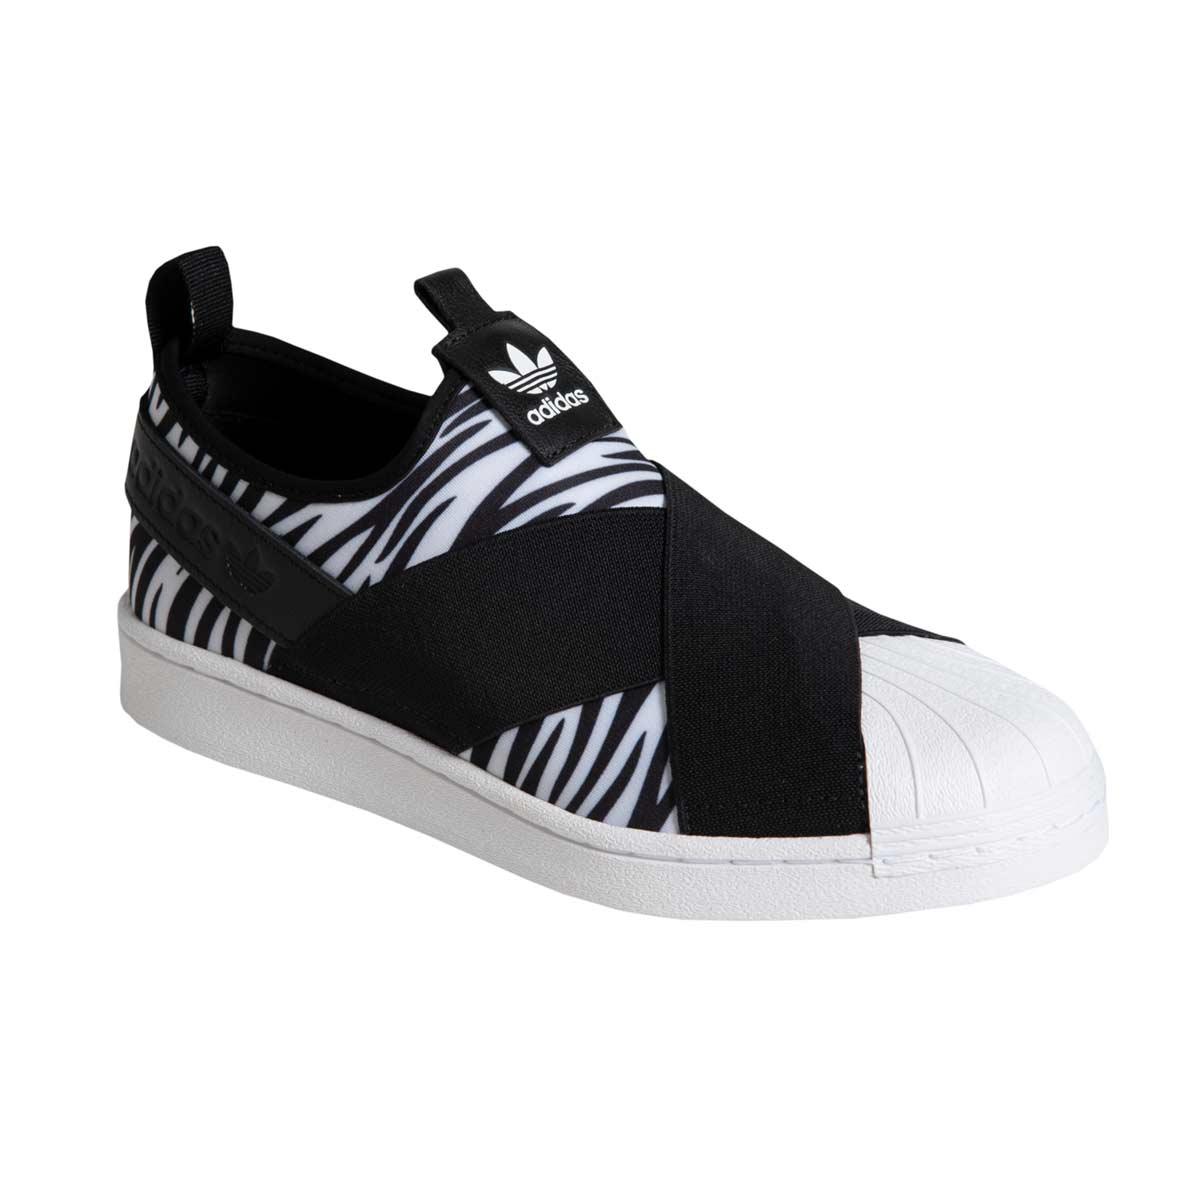 Tenis-Adidas-Superstar-Slip-On-W-Zebra--34-ao-39-EX4622--4Q20-